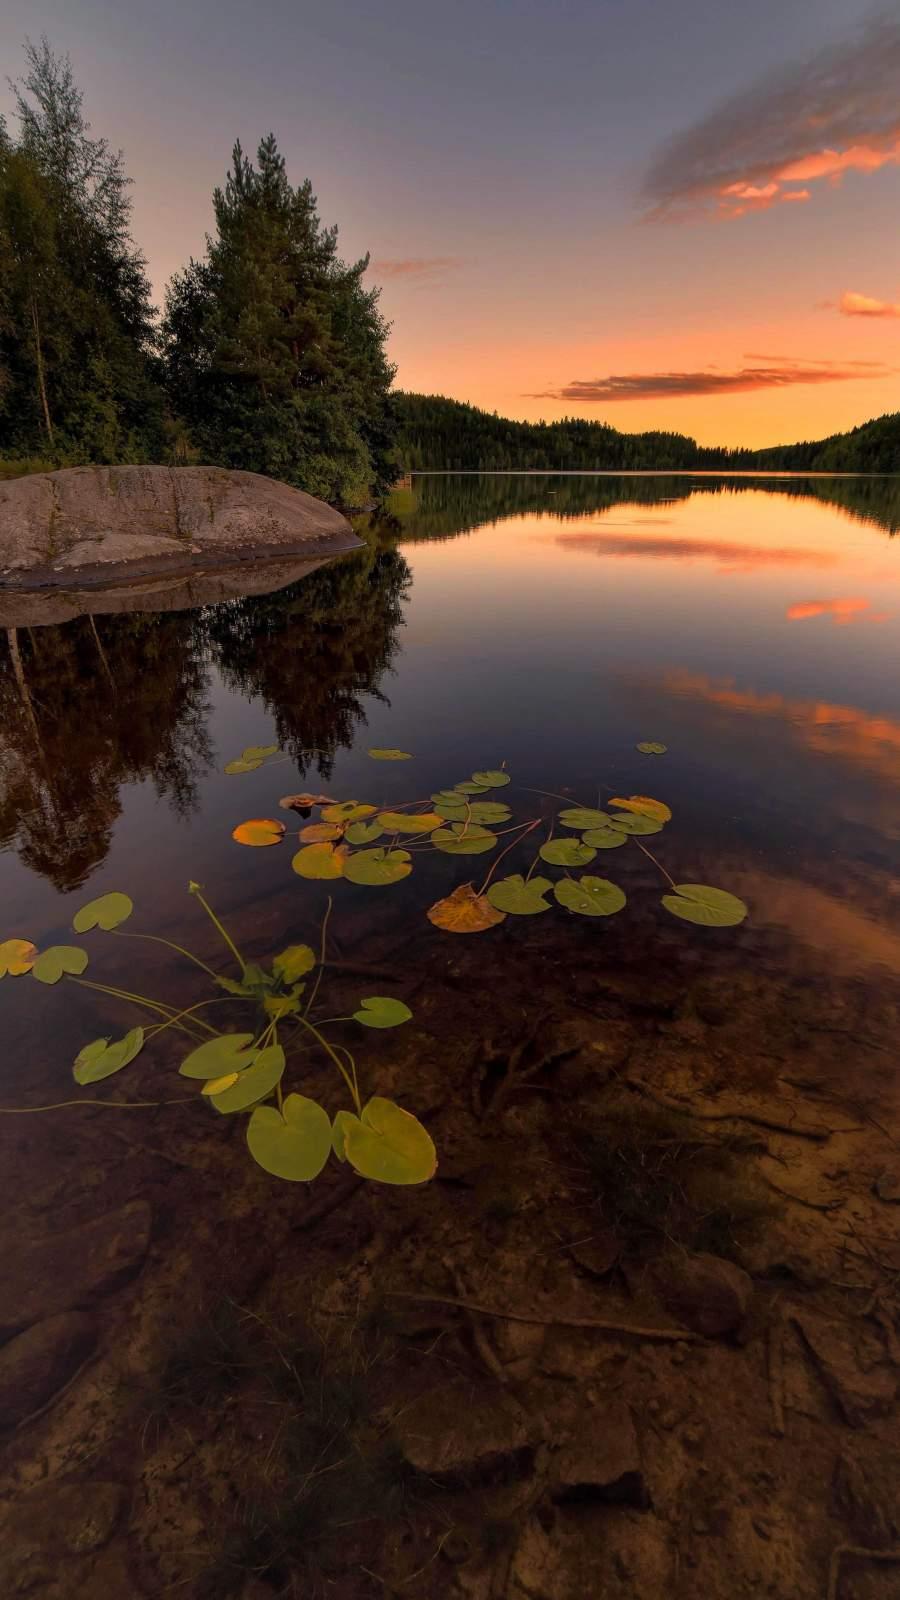 Lake Reflection Nature Sunset